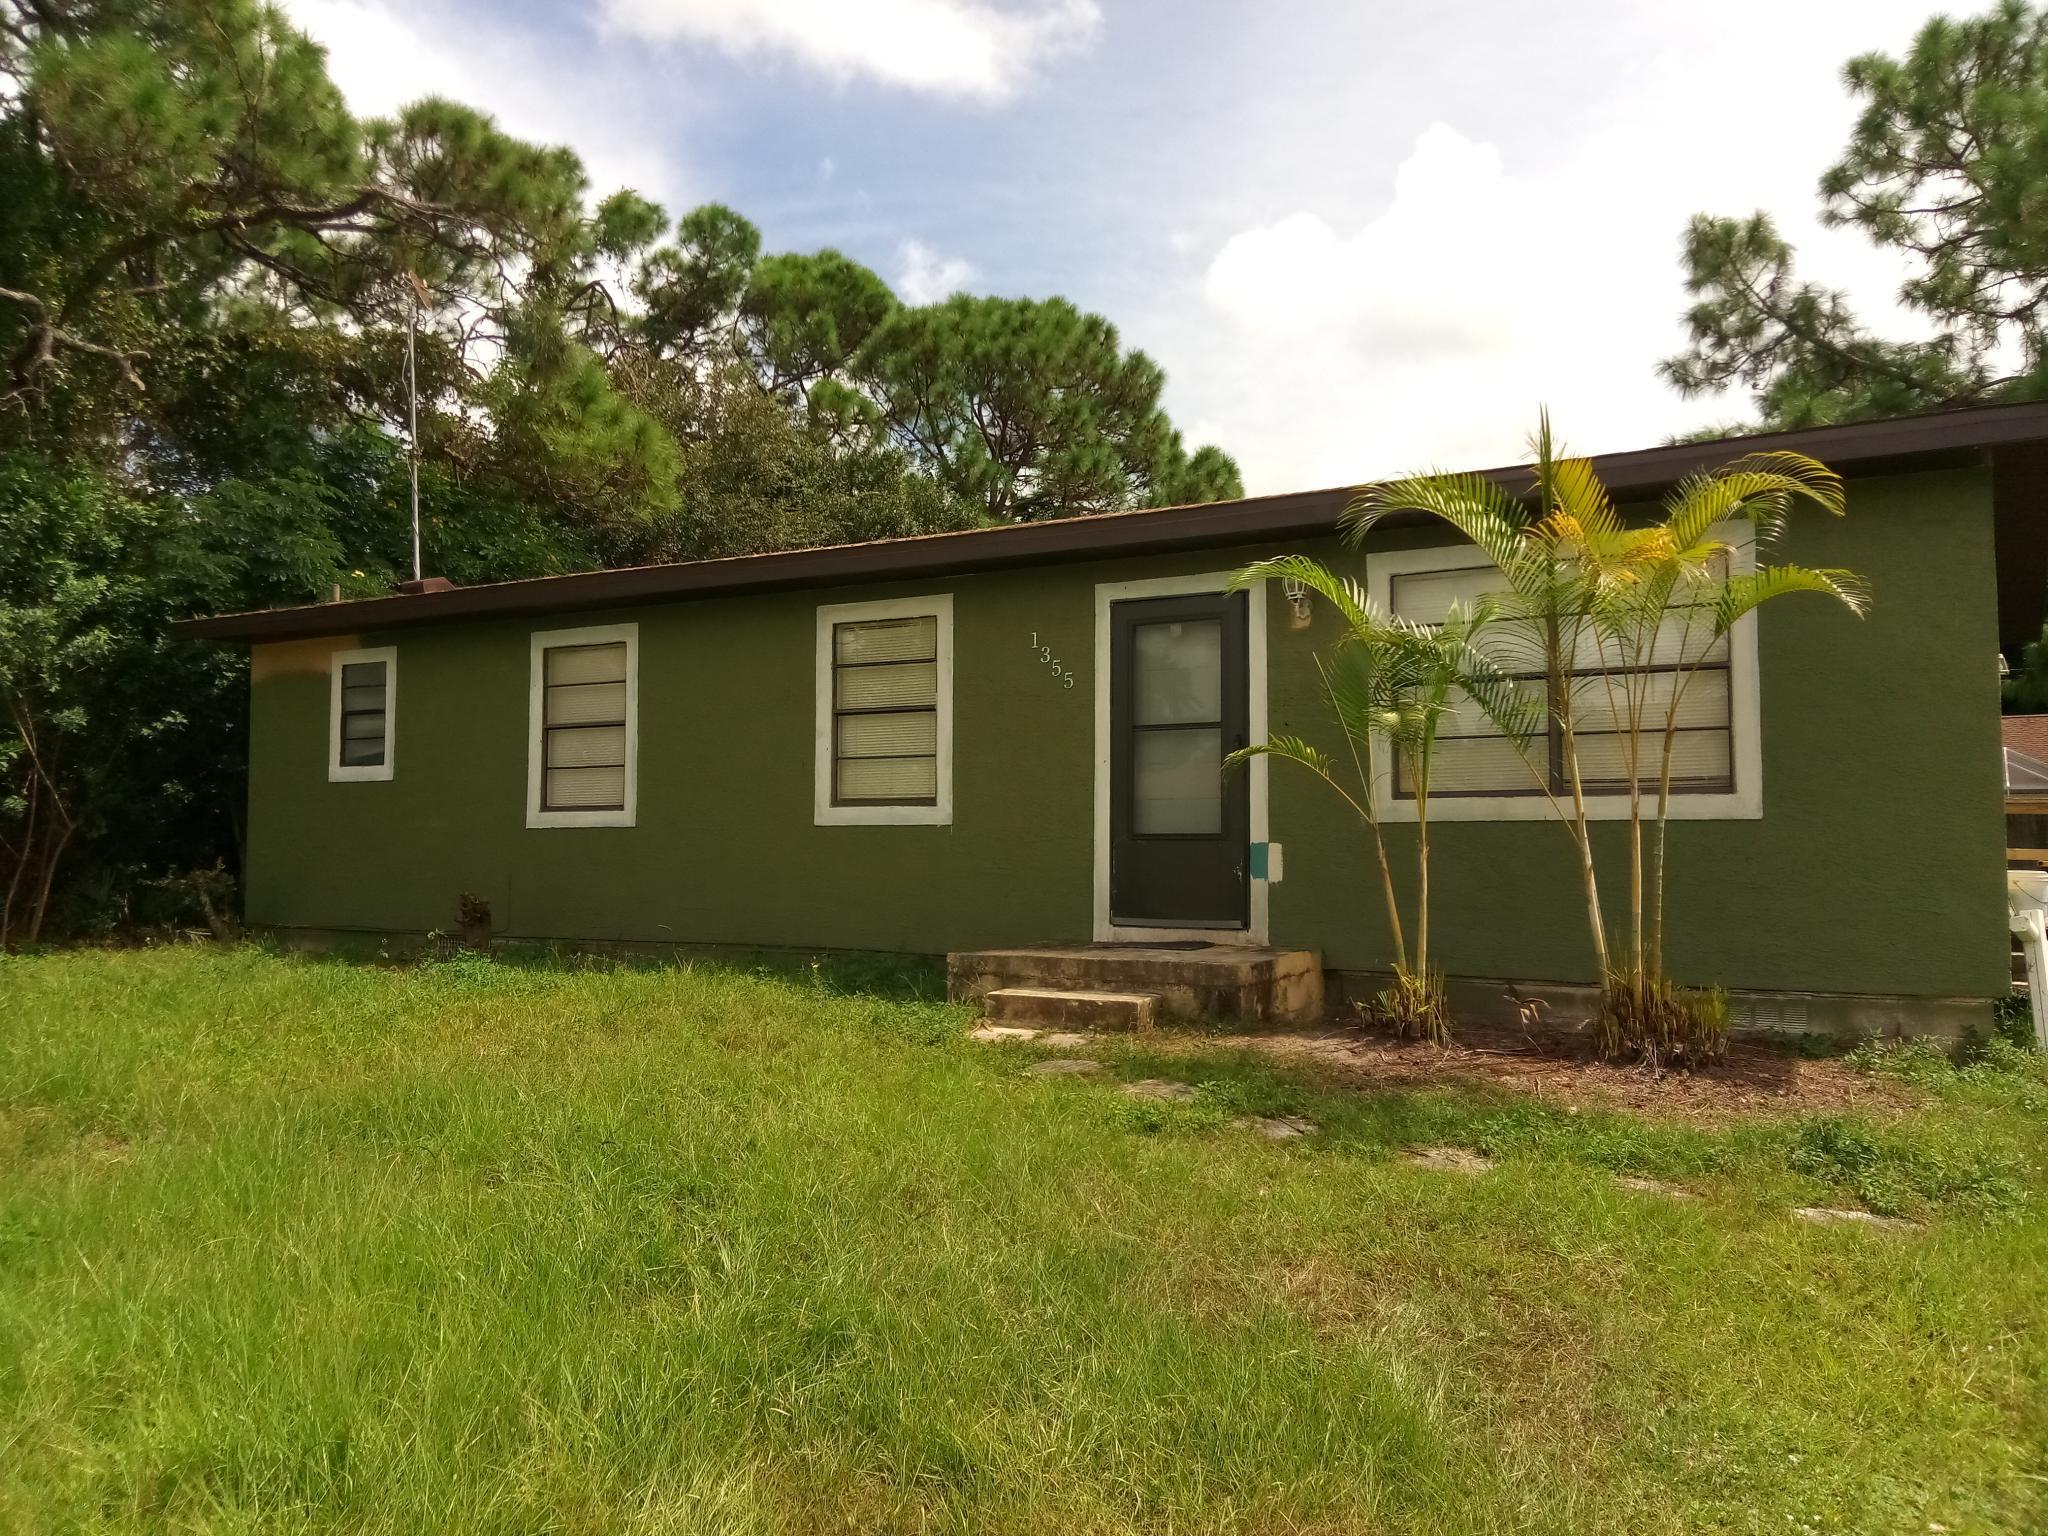 1355 Giralda Cir NW, Palm Bay, FL 32907 For Rent | Trulia